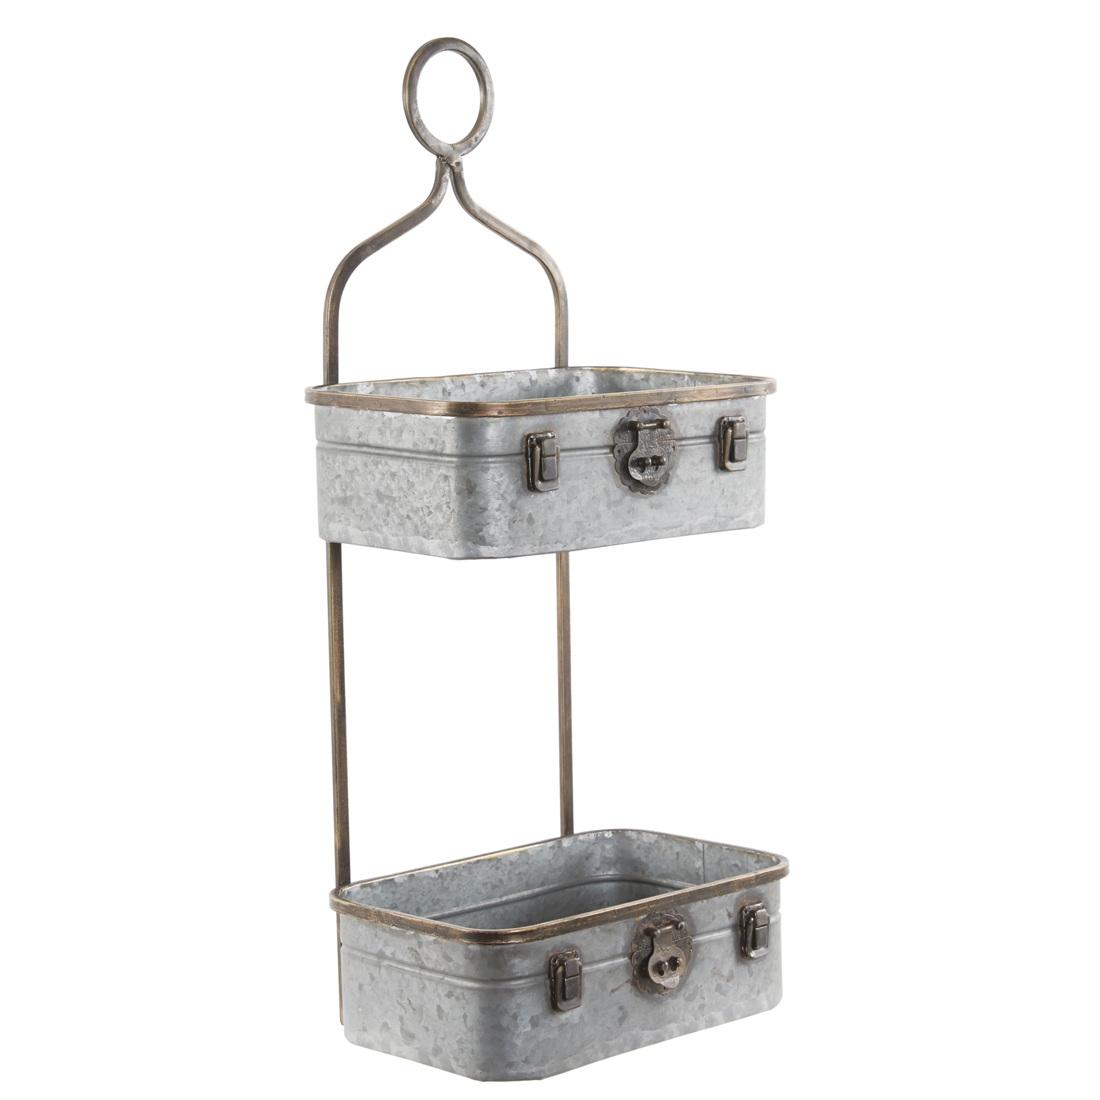 grey metal wall mounted 2 tier hanging suitcase storage. Black Bedroom Furniture Sets. Home Design Ideas